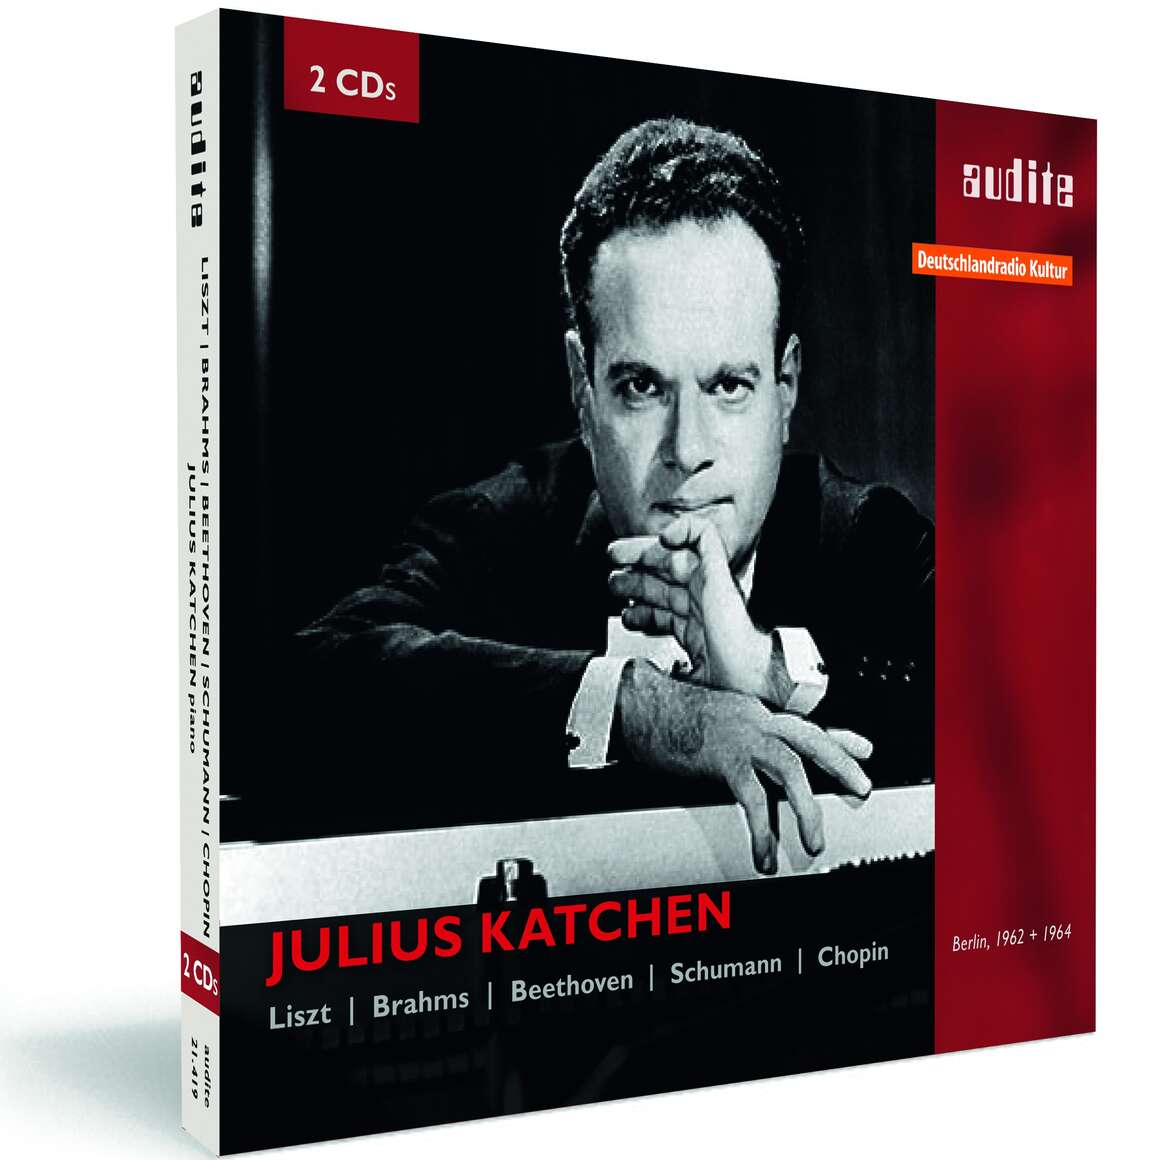 Julius Katchen plays Liszt, Brahms, Beethoven, Schumann and Chopin